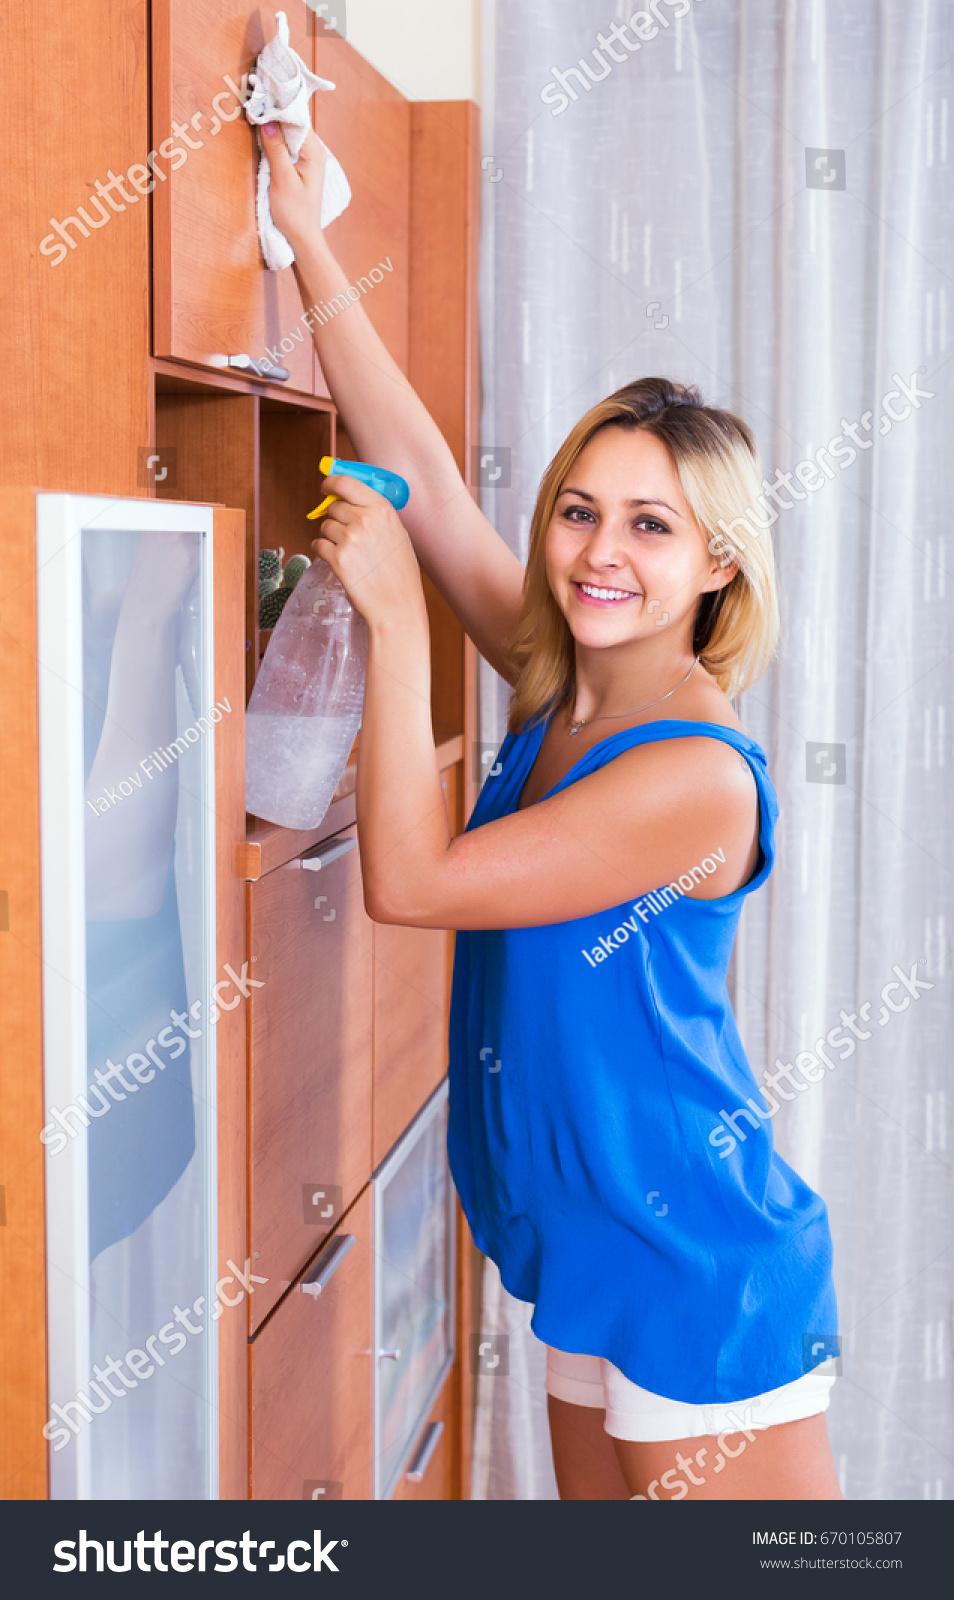 dusting furniture. Ordinary Smiling Blonde Girl In Blue Blouse Dusting Furniture Indoors